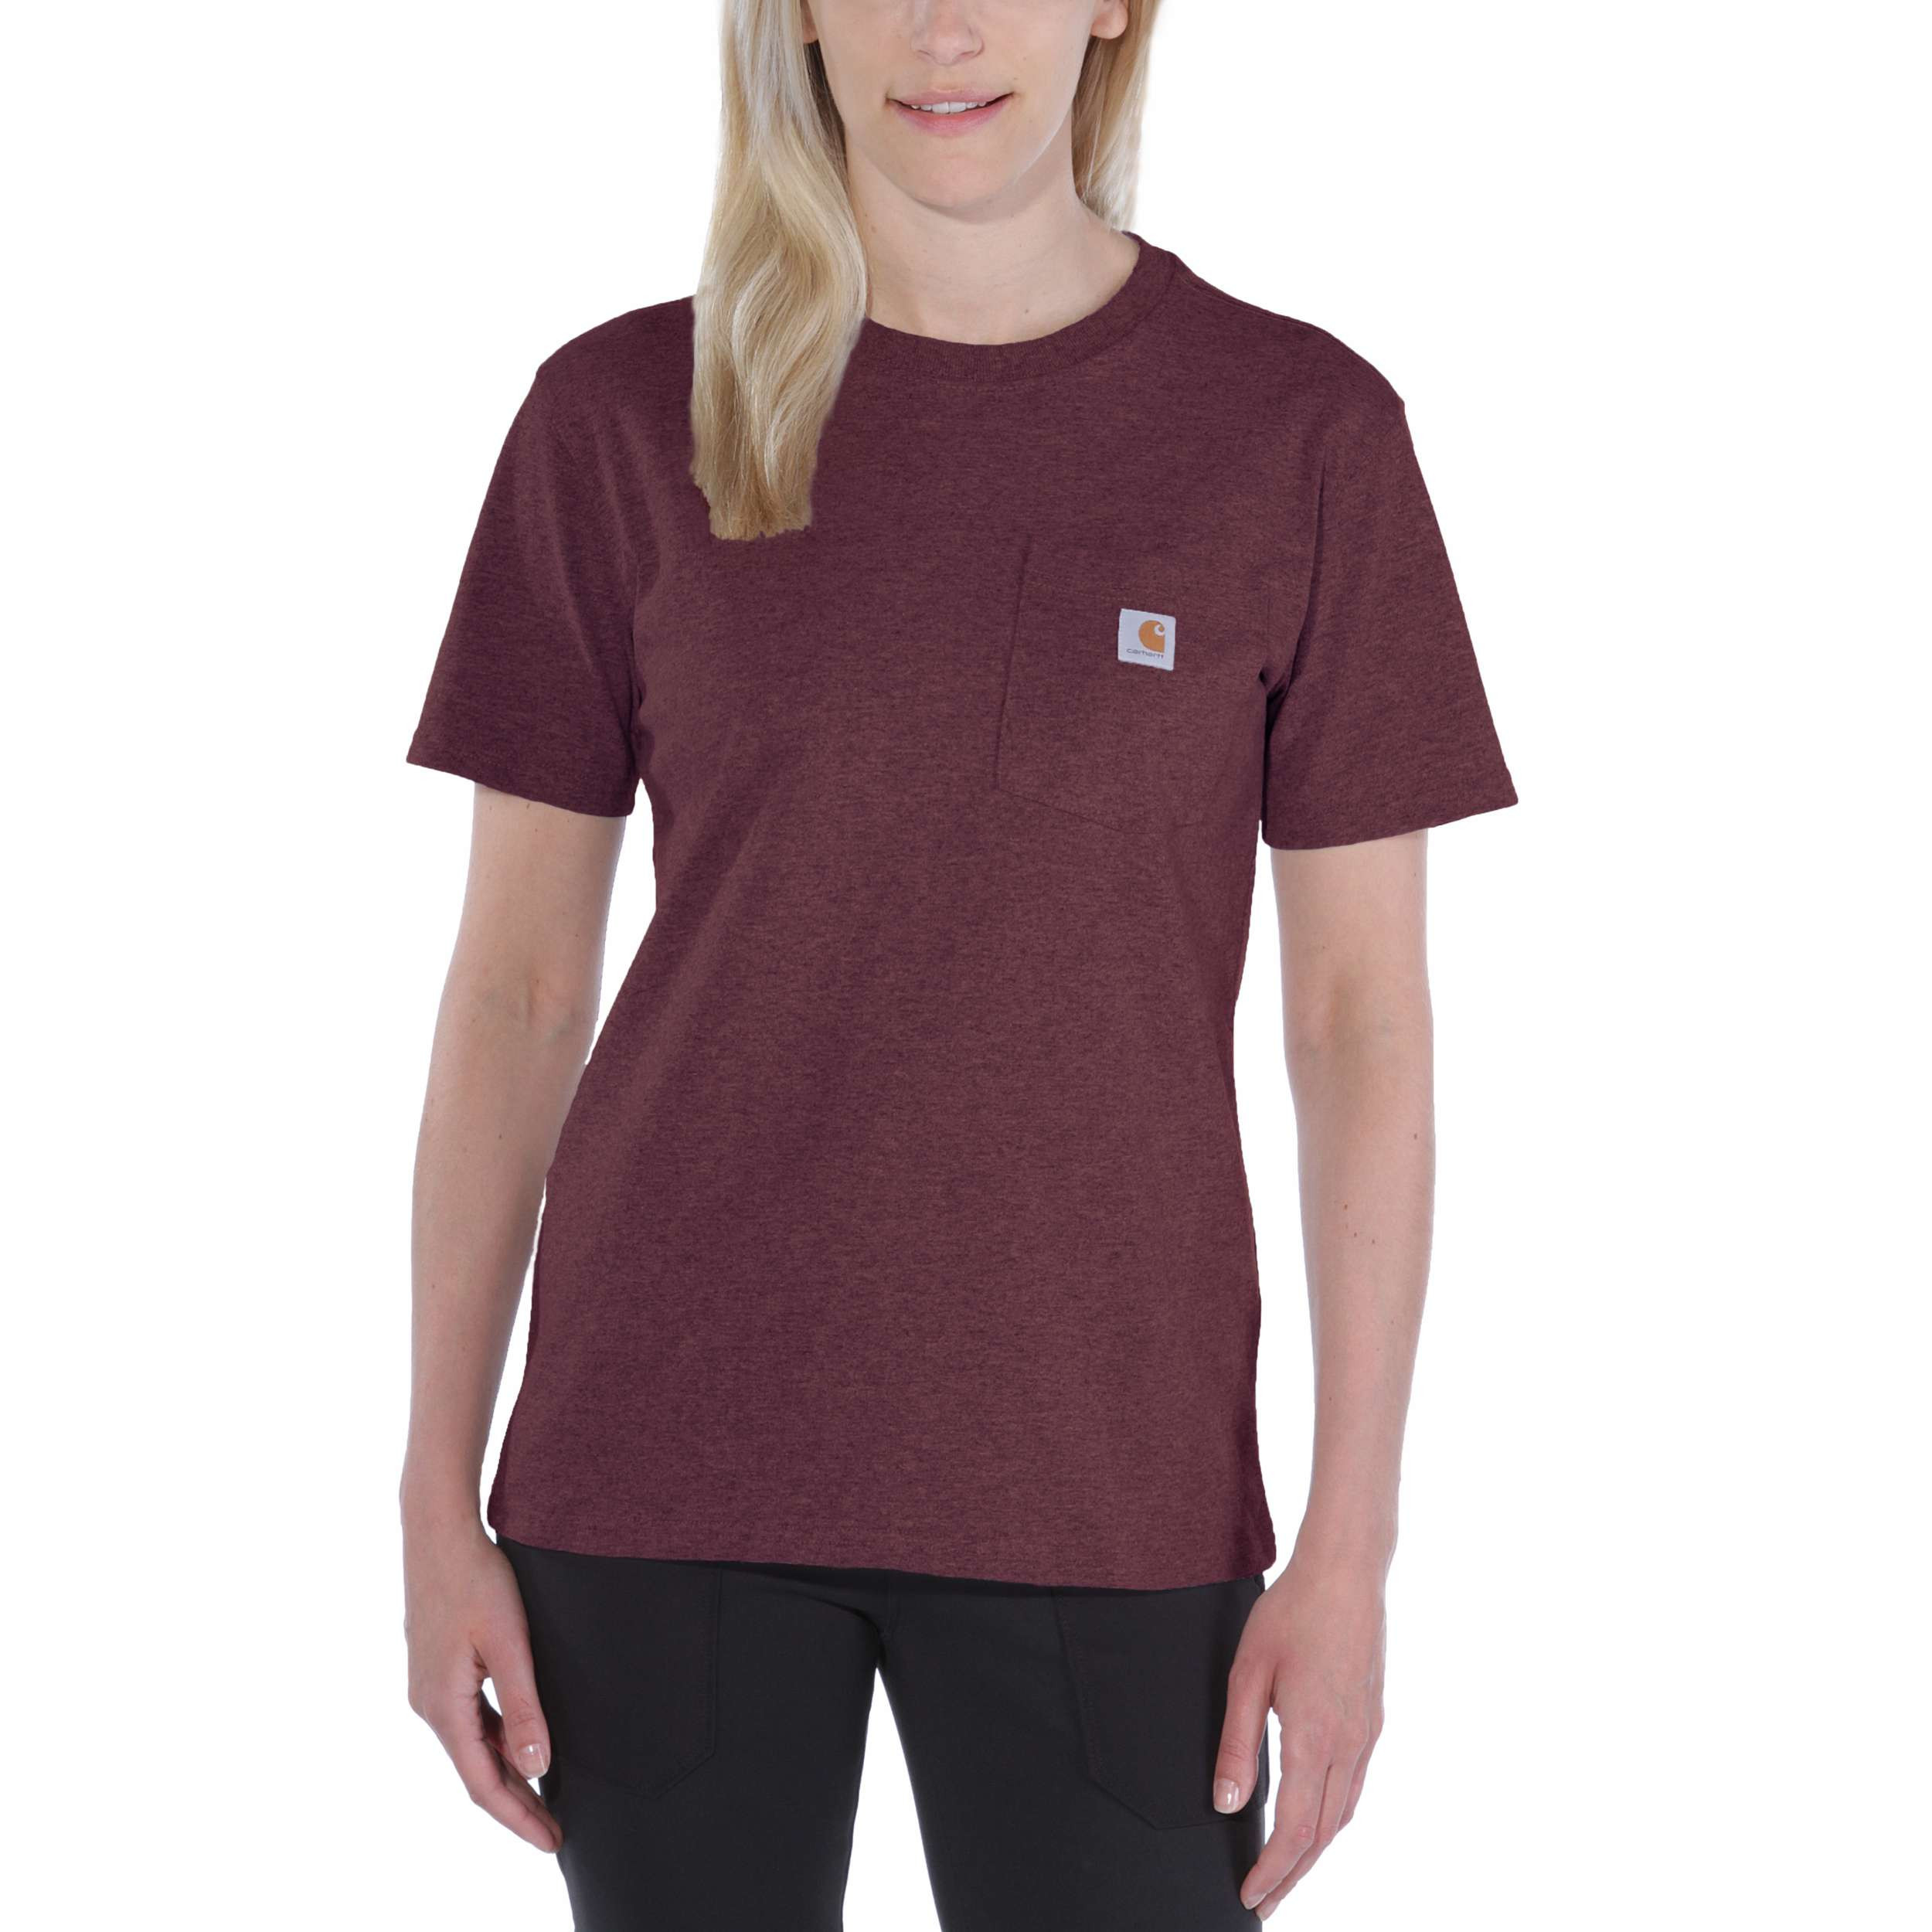 Футболка женская Carhartt WK87 Workwear Pocket T-Shirt - 103067 (Deep Wine, S)